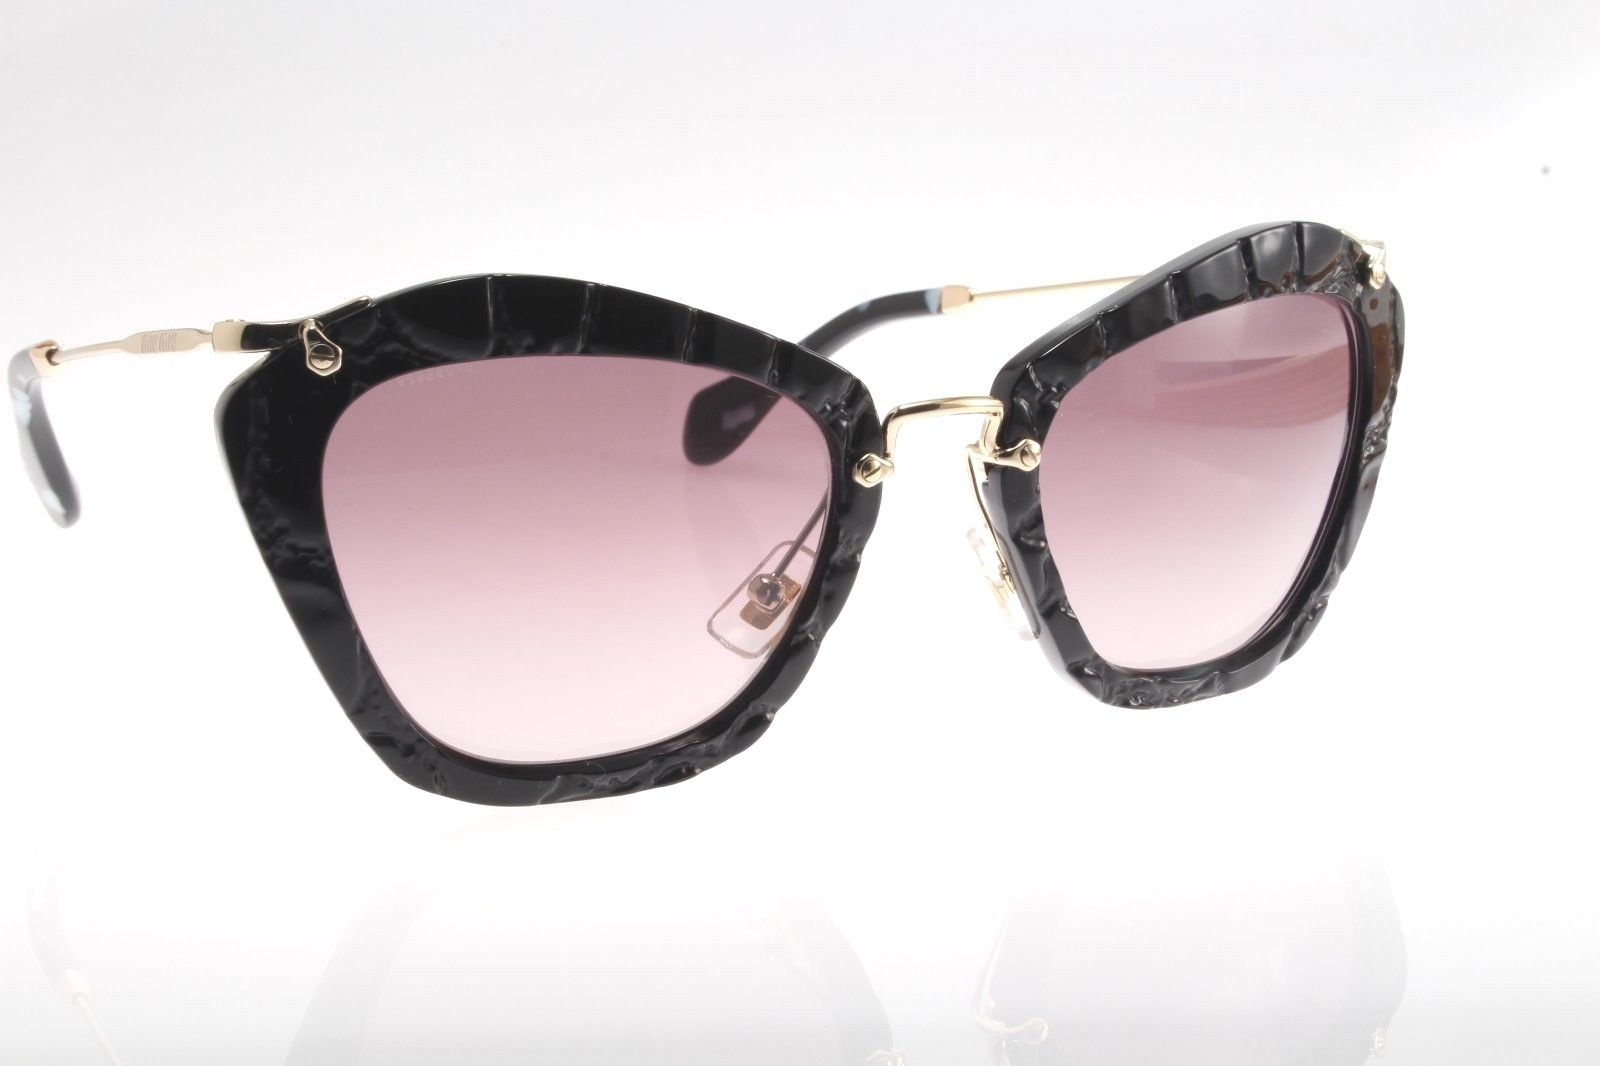 f3c6245fba4 New original Miu Miu SMU 10NS USW-3M1 55 Women`s Sunglasses Black Gray  Gradient